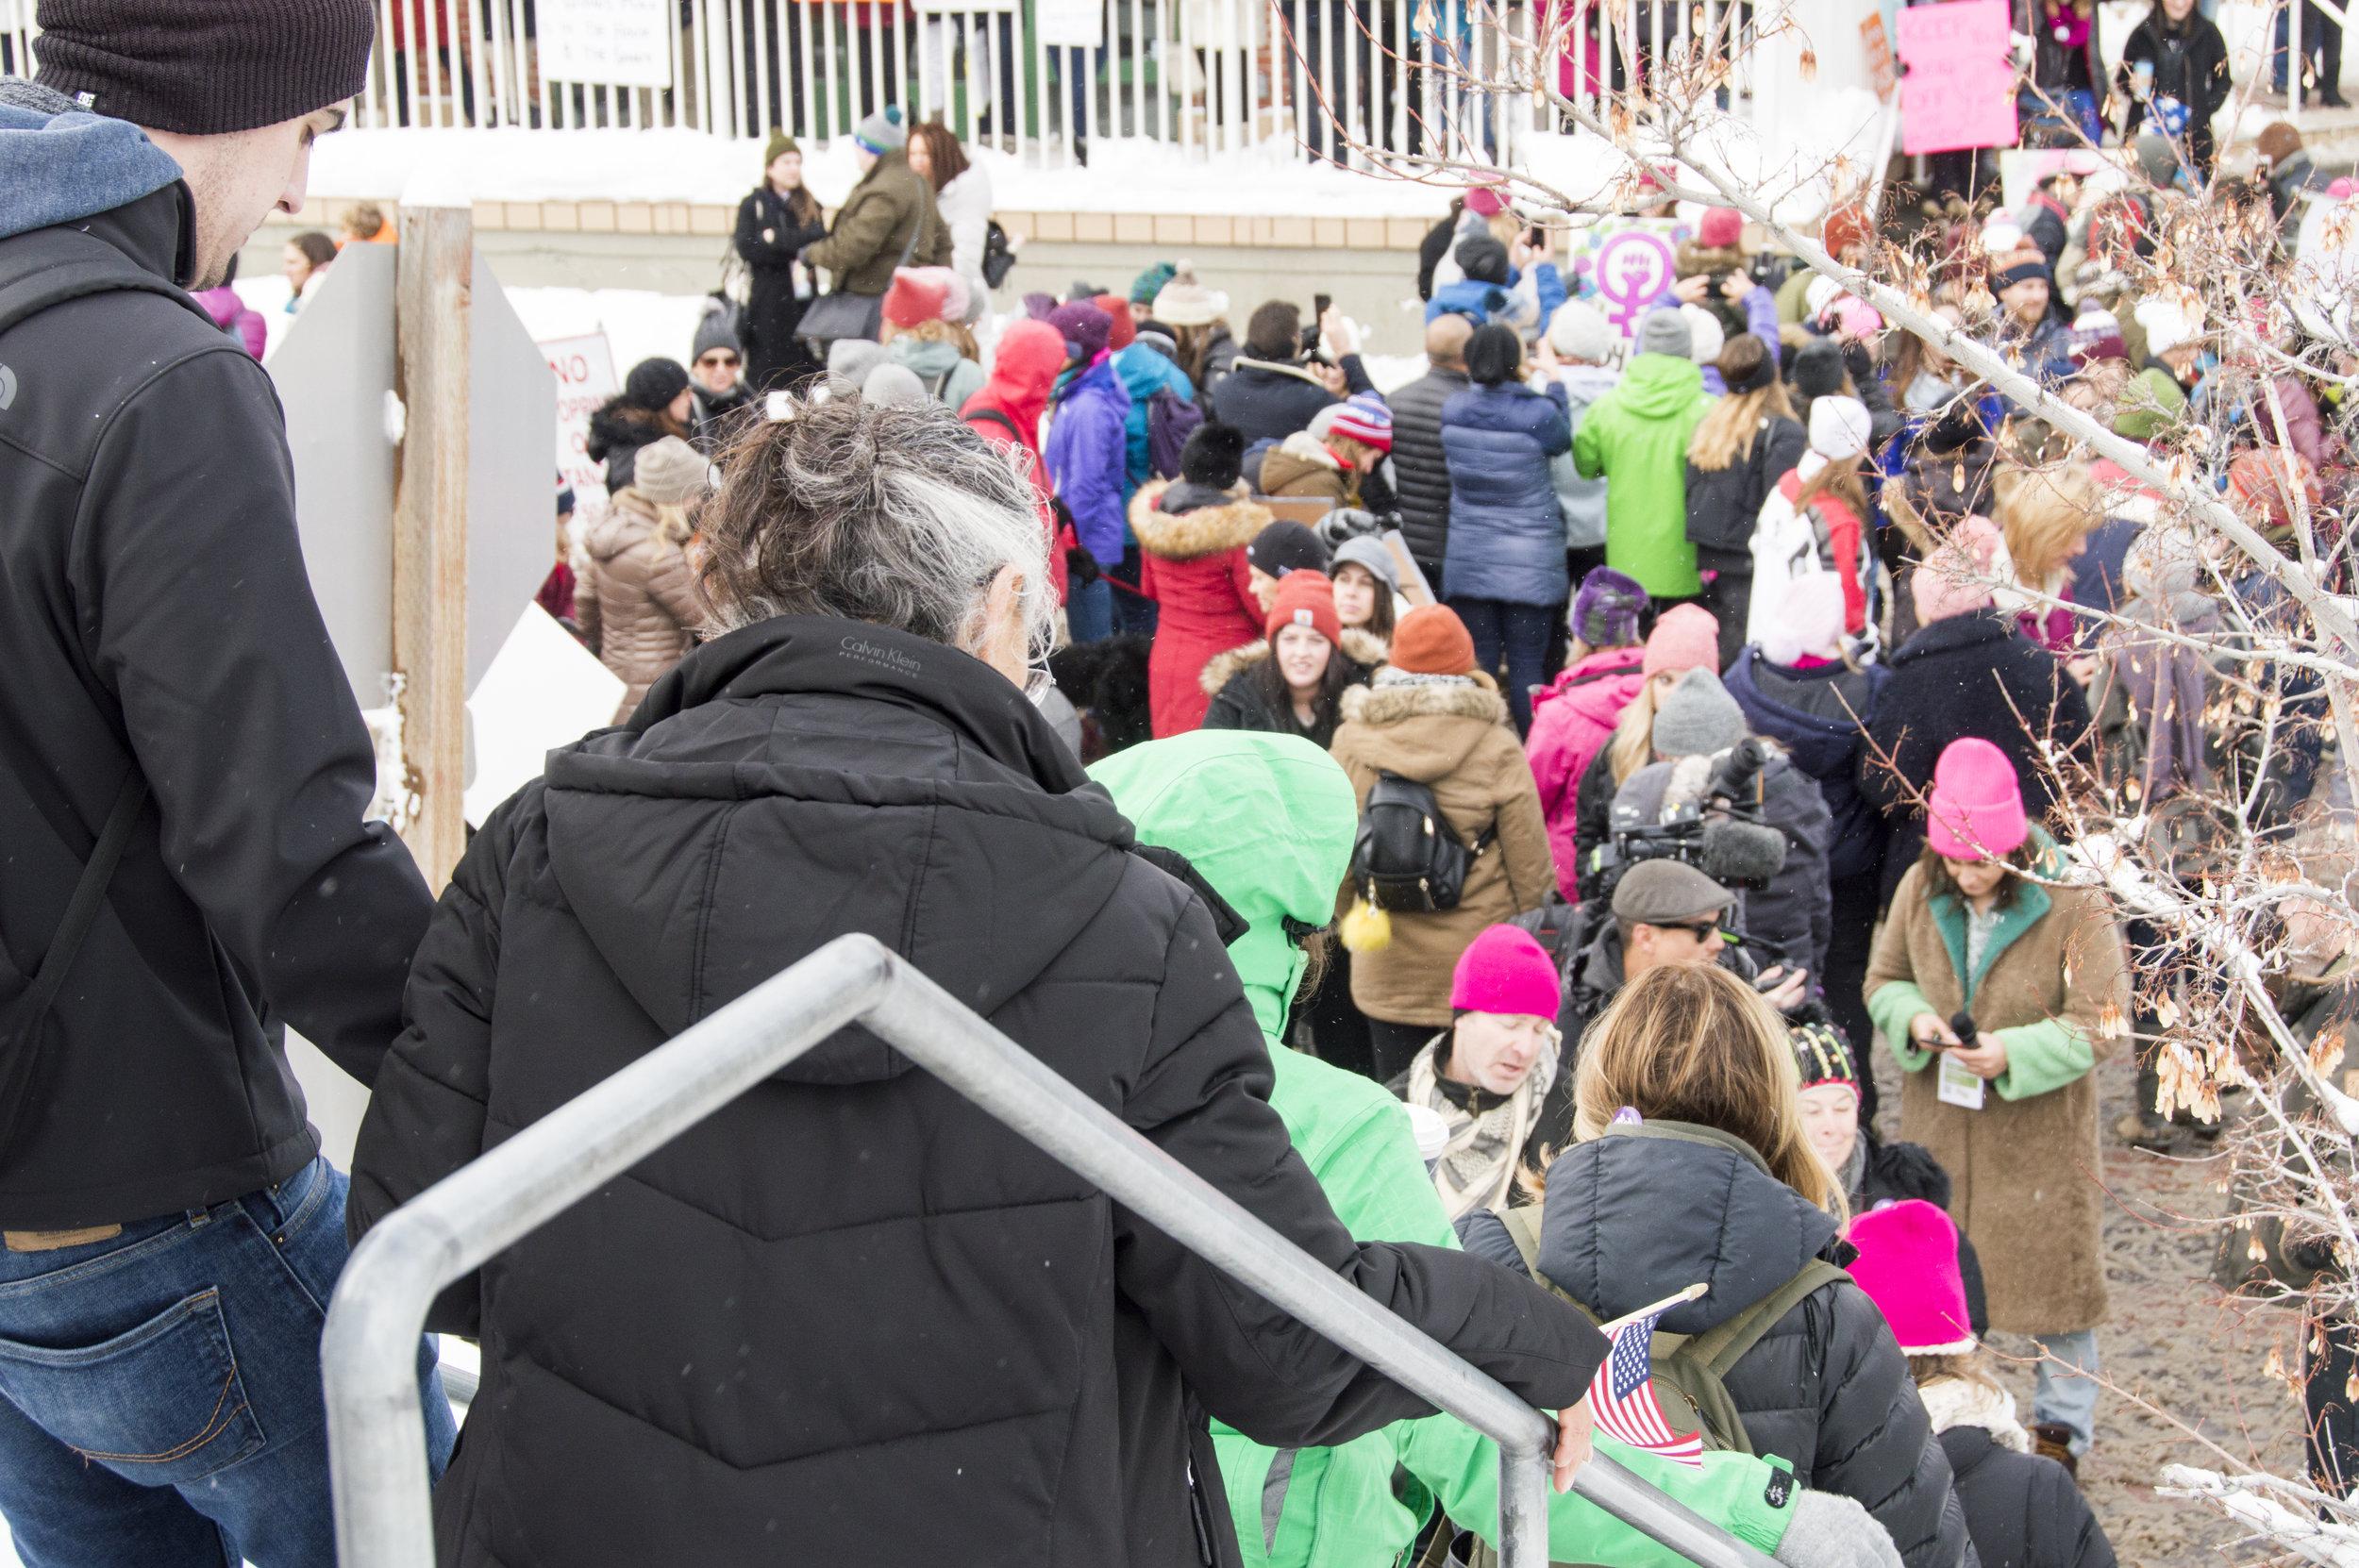 womens march_012117_gigi m kisela049.jpg